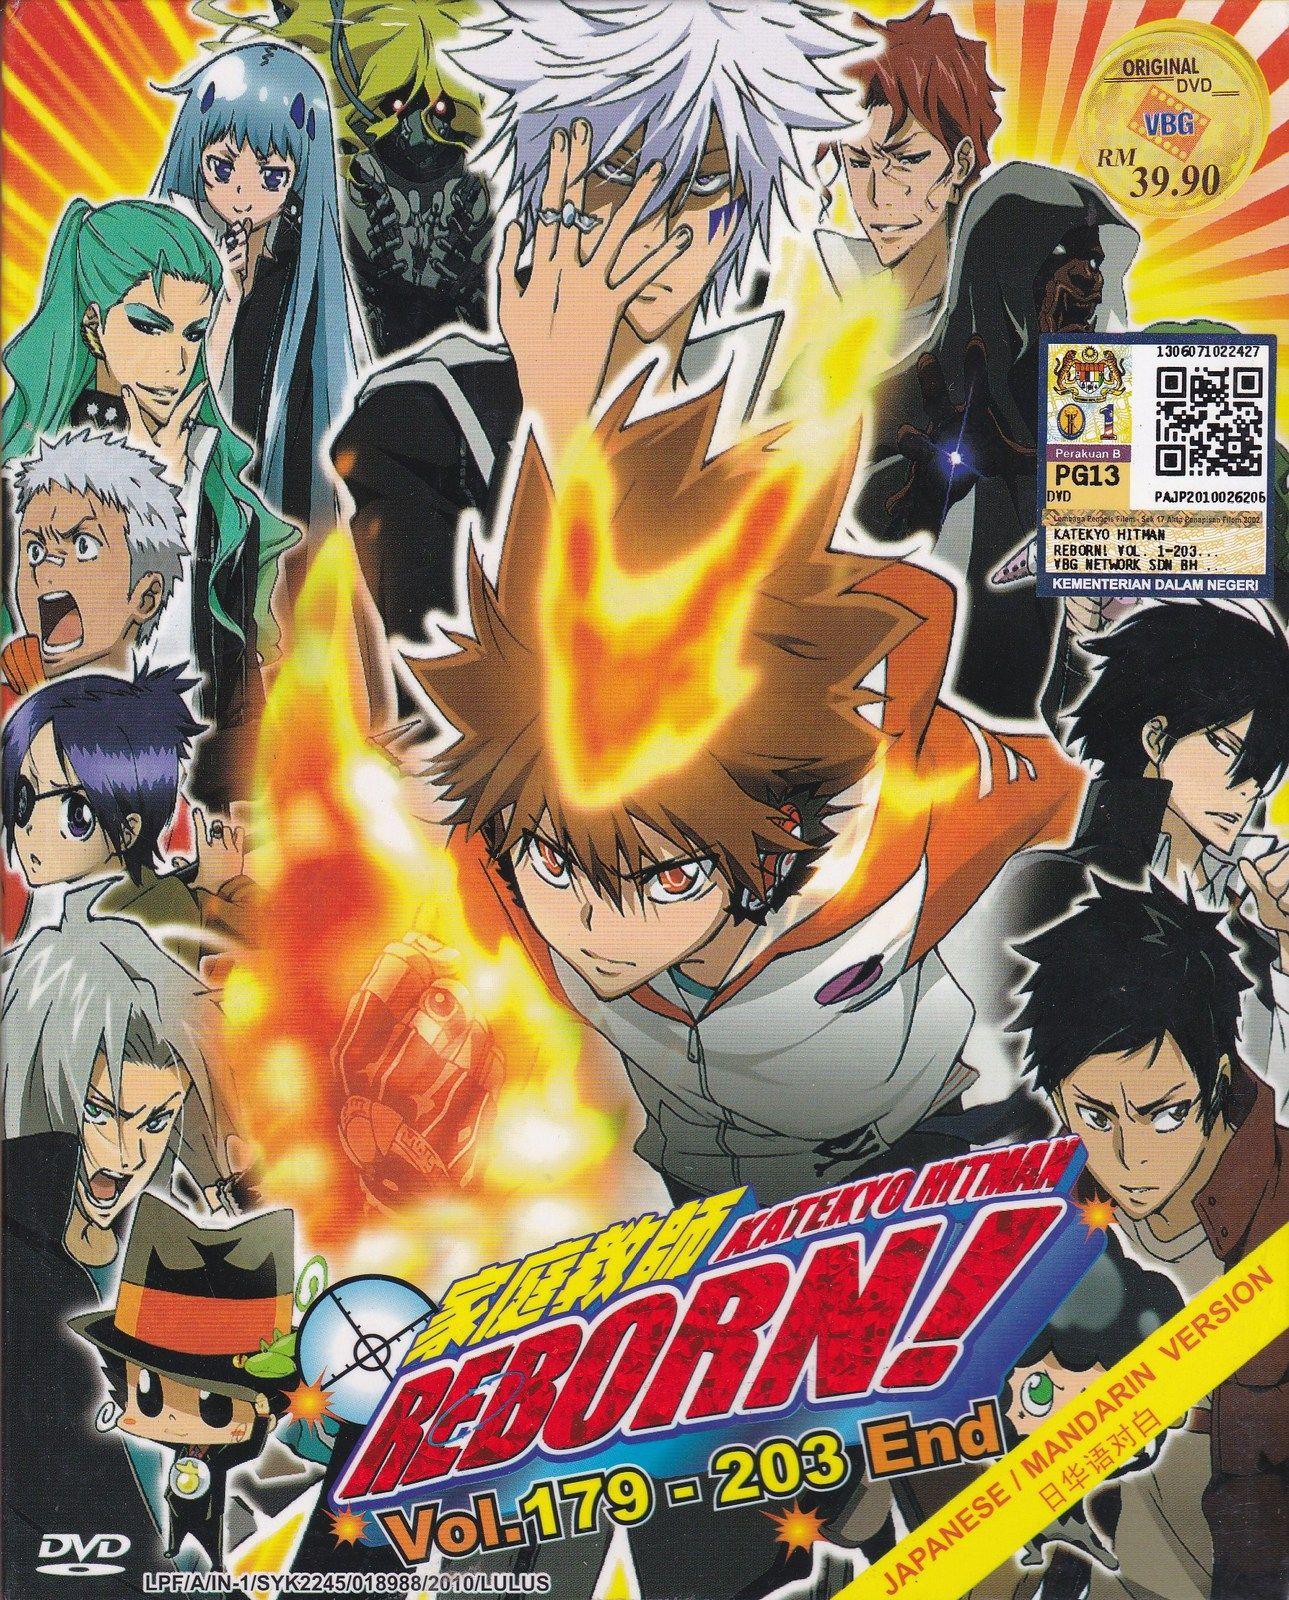 DVD ANIME KATEKYO HITMAN REBORN Vol.179-203End Region All